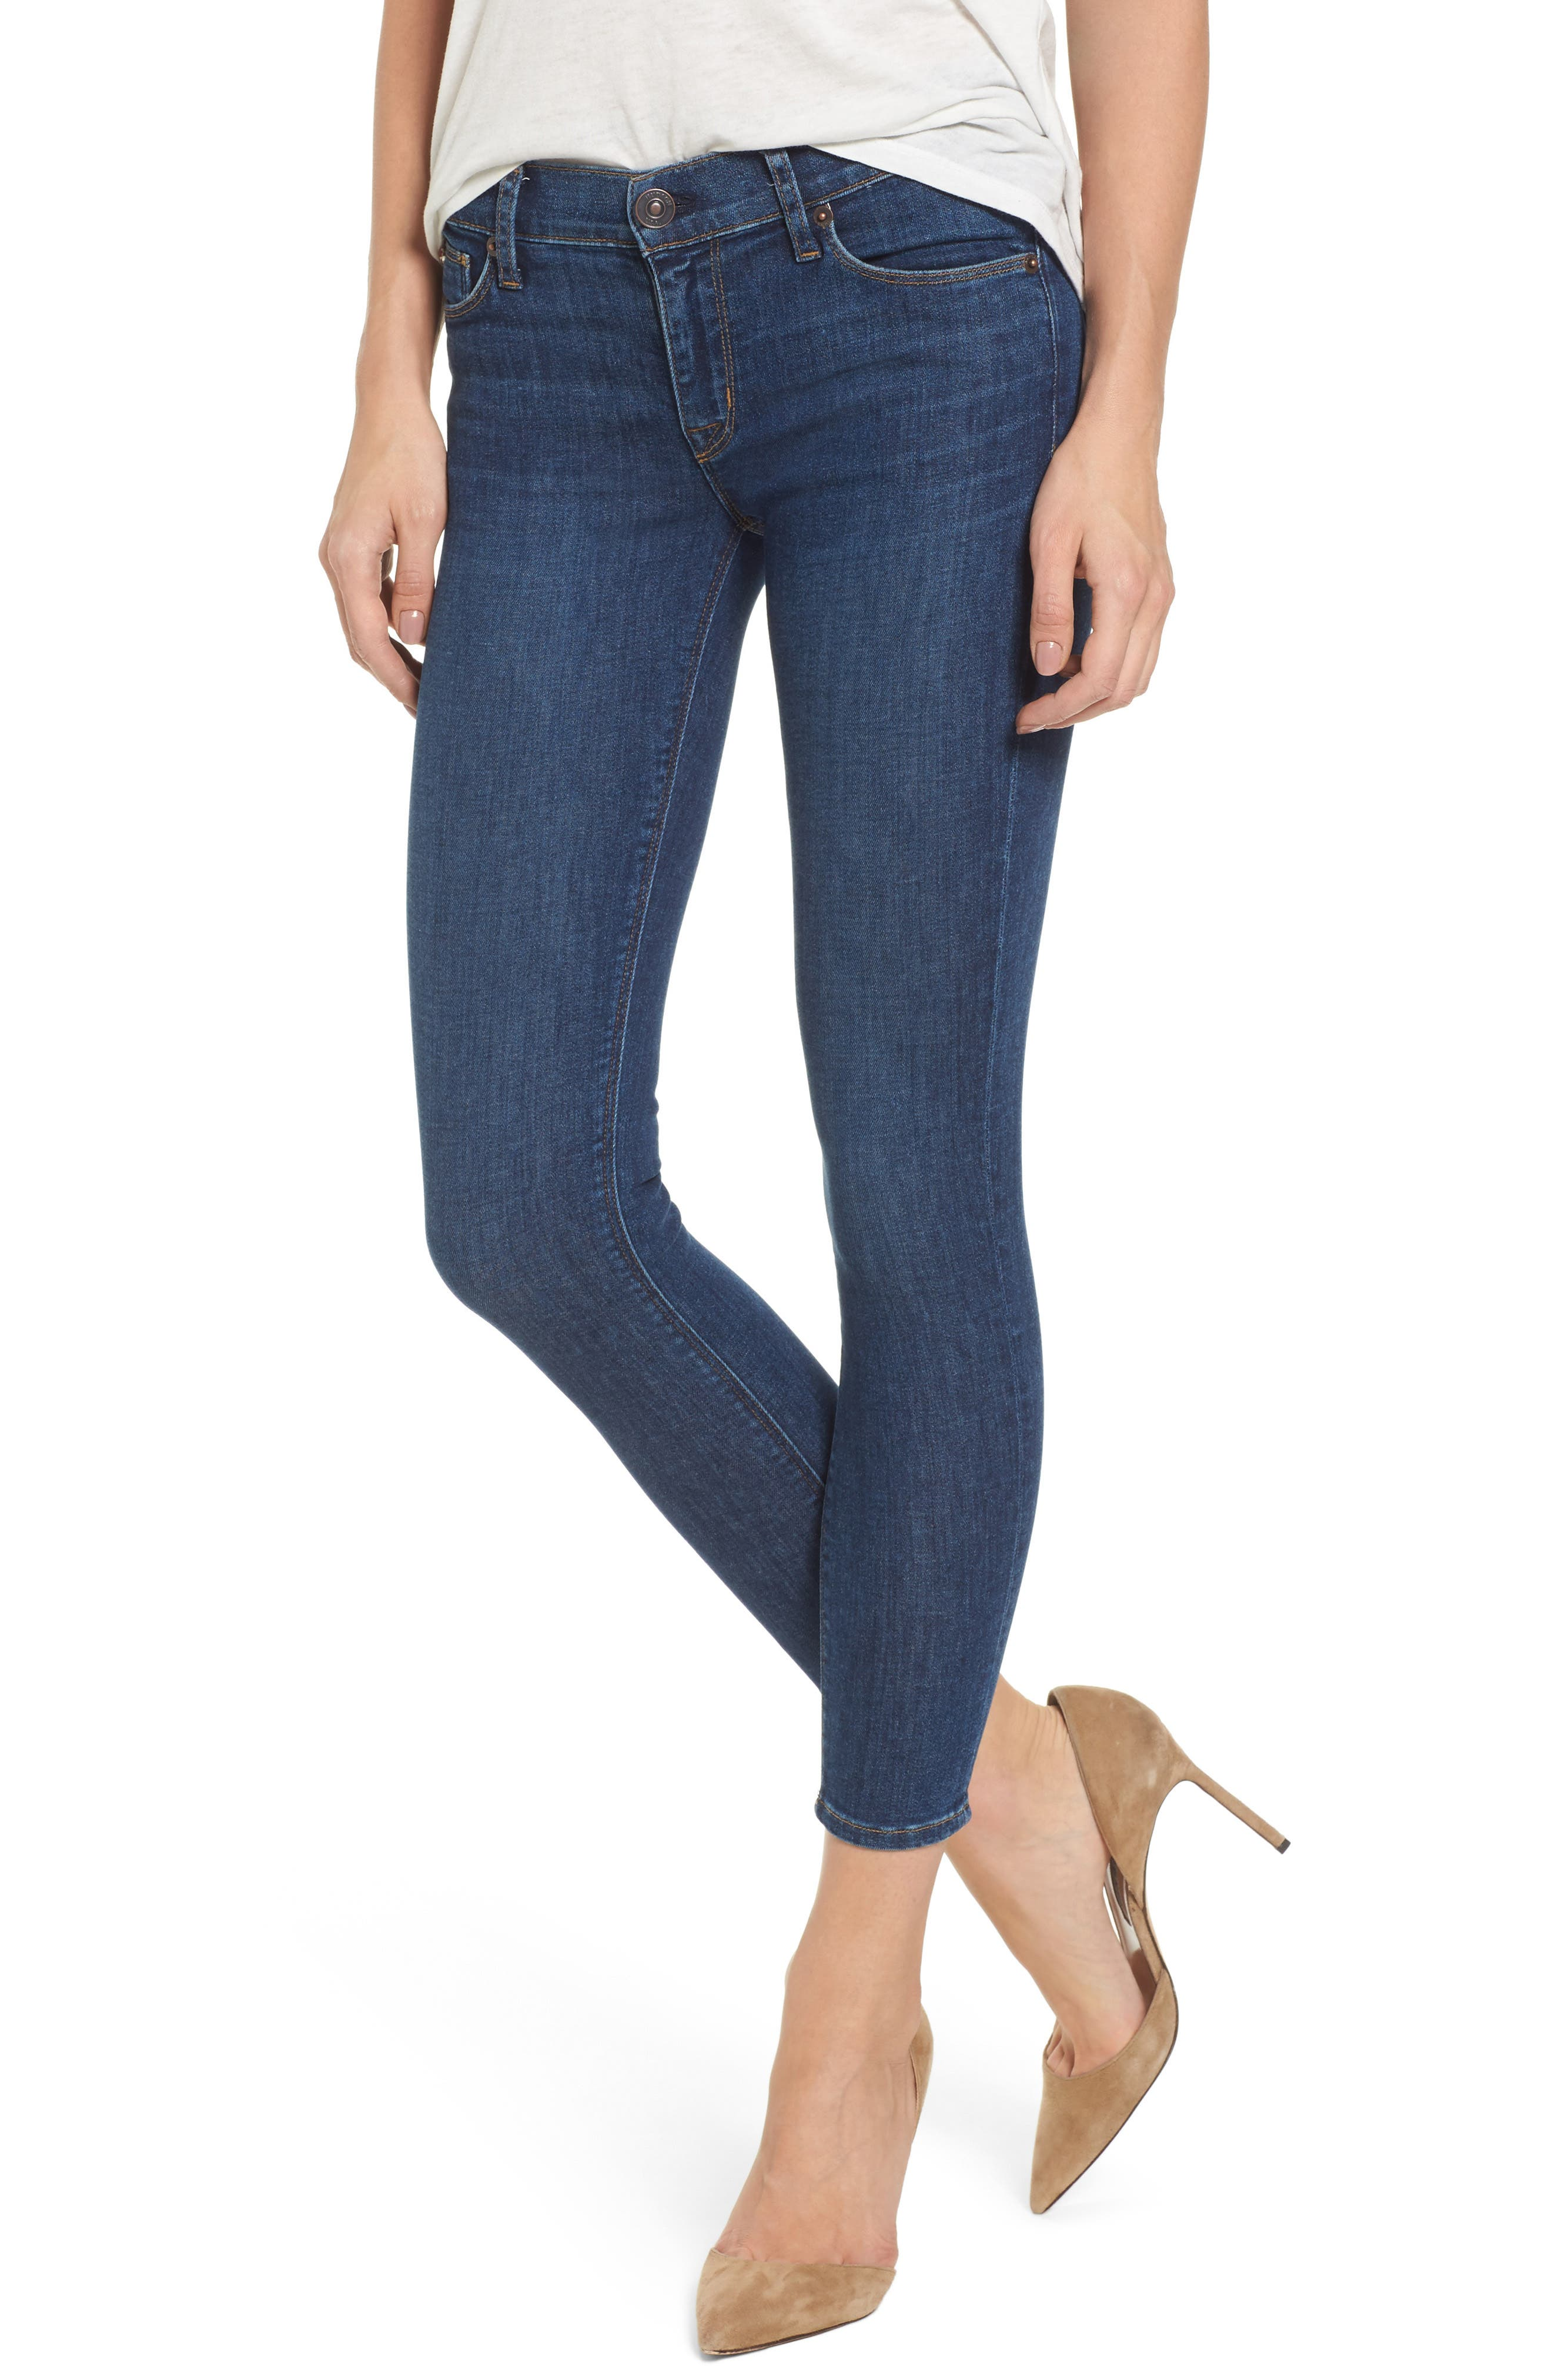 Main Image - Hudson Jeans Krista Ankle Super Skinny Jeans (Infinity)